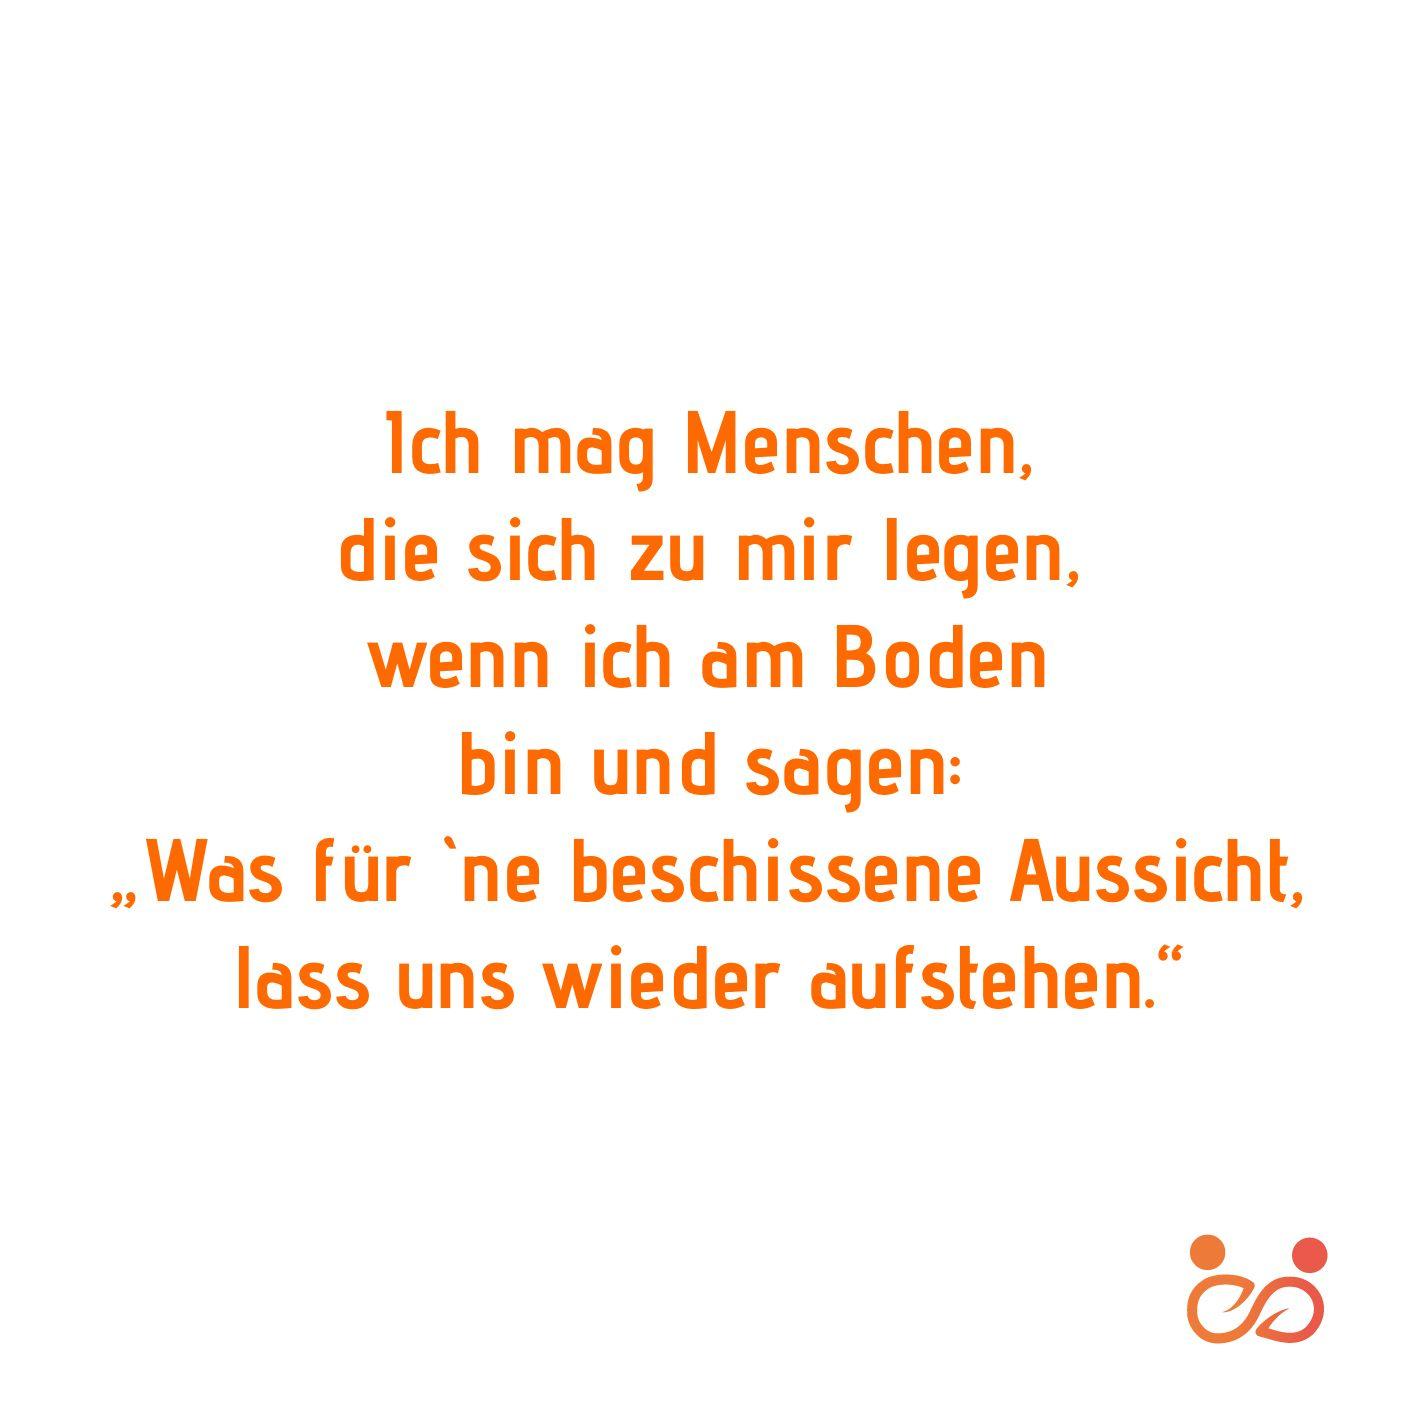 SoulMe - Neue Freunde finden App #soulme #kennenlern #freundschaft #charakter #seelenverwandtefinden